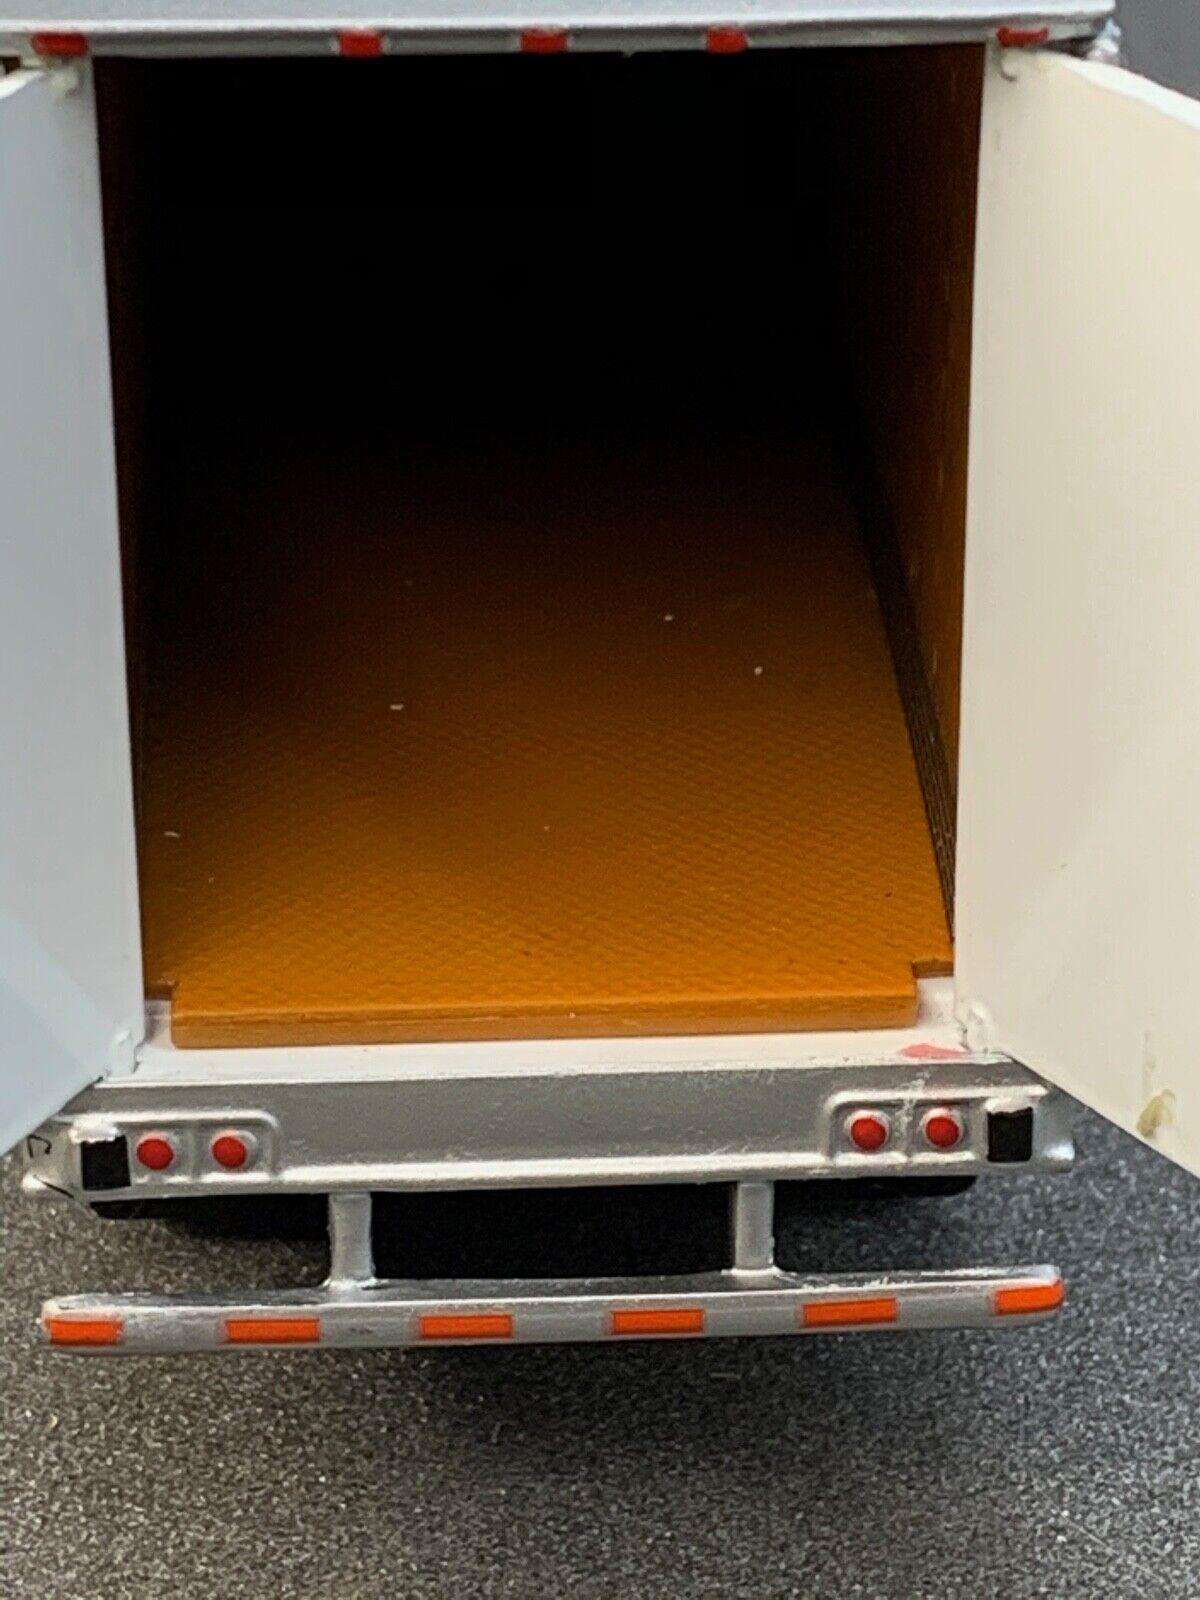 1/64 DCP SIMON'S TRUCKING  53' UTILITY 3000D-X DRY VAN TRAILER W/ WIND SKIRTS 2